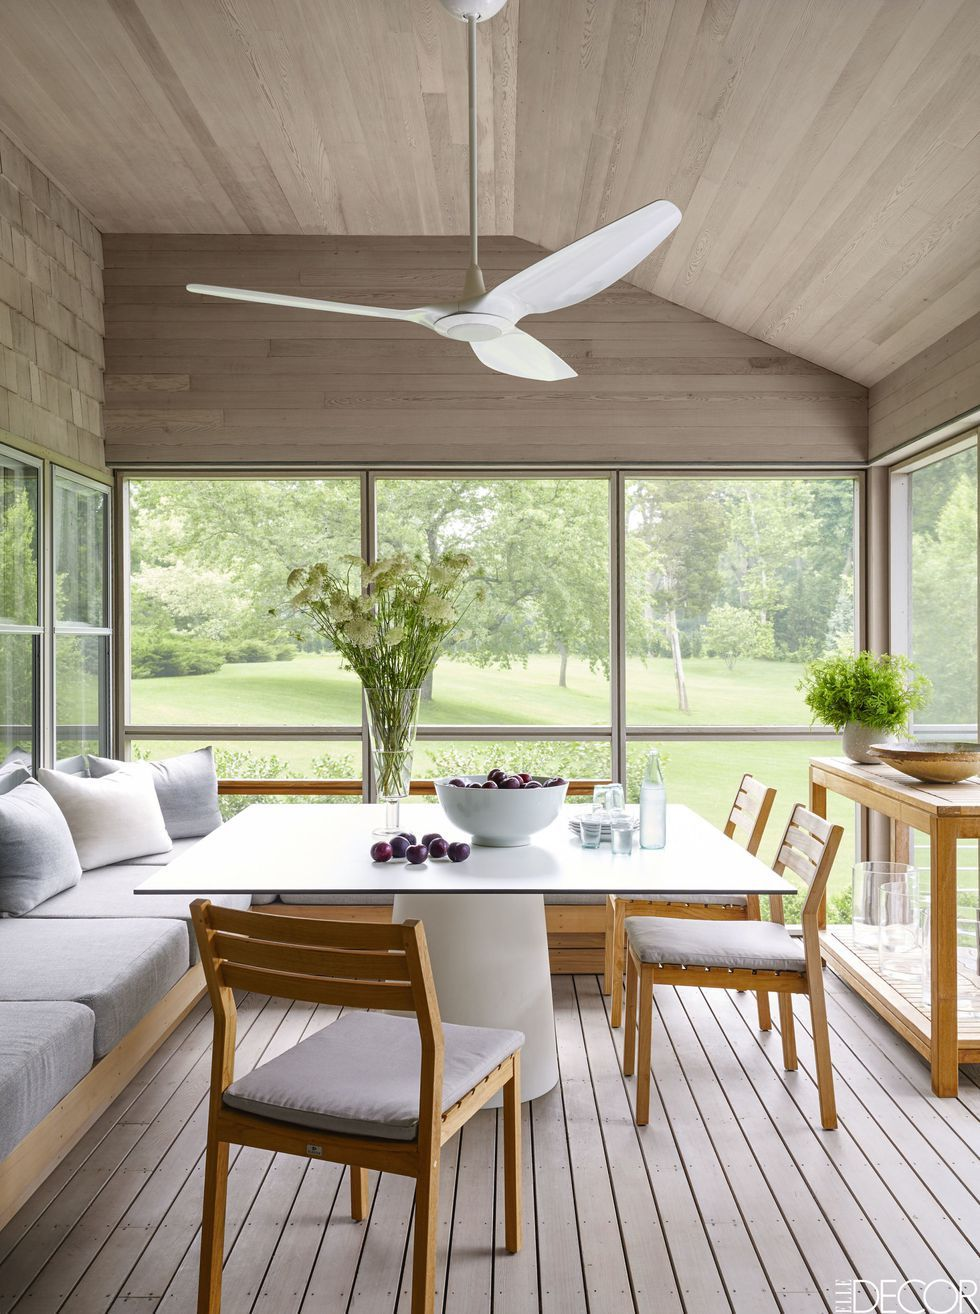 33 Coastal Home Decor Ideas - Rooms with Coastal Style